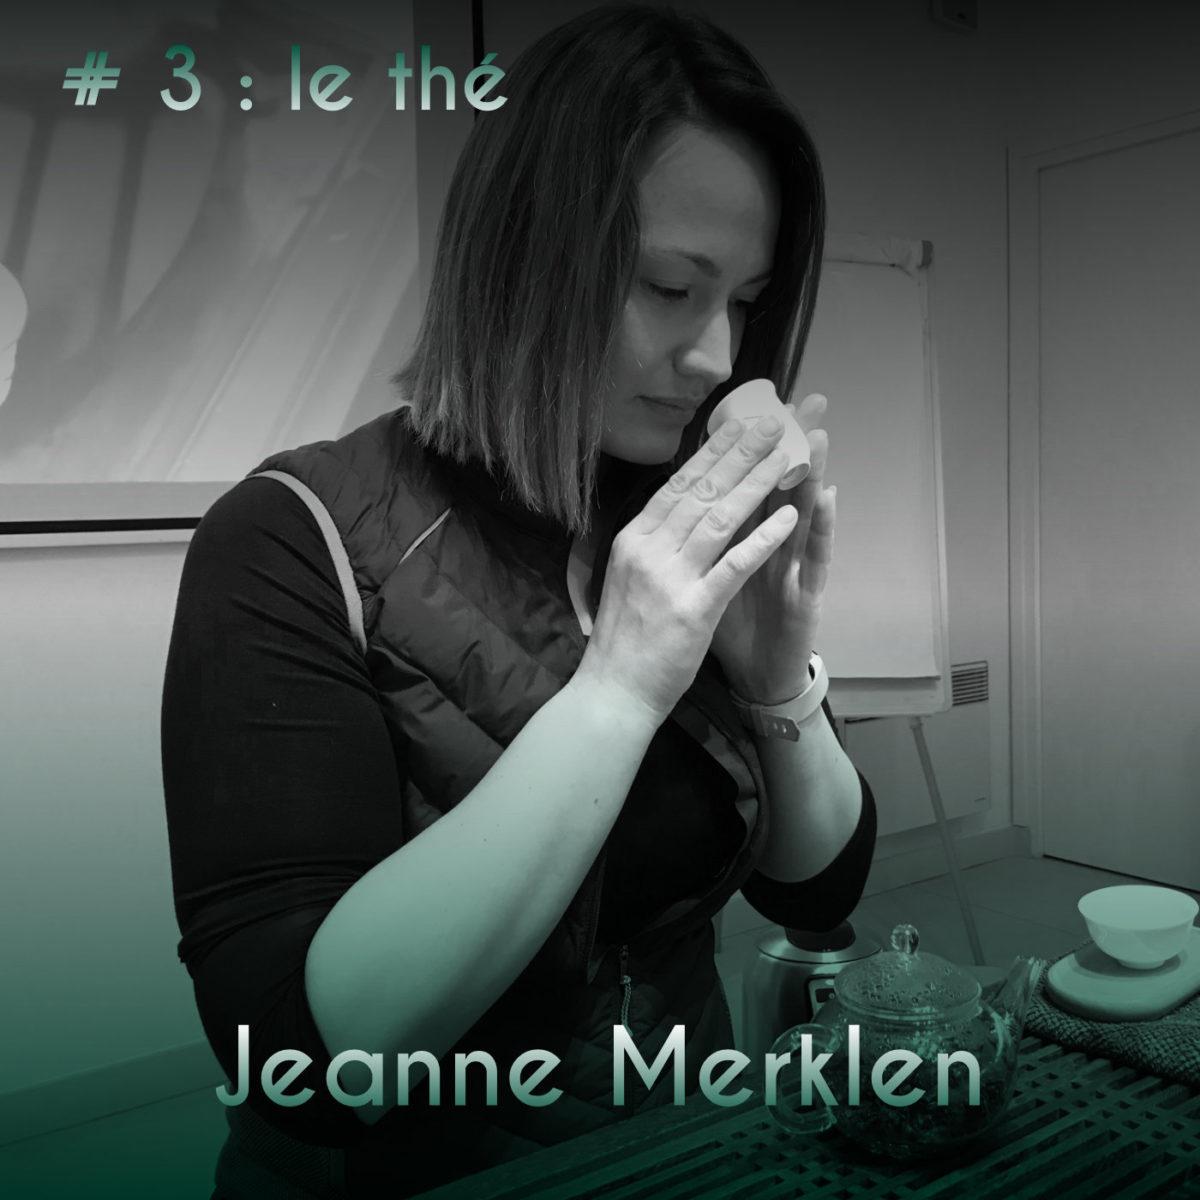 Couverture Podcast #3 Jeanne Merklen